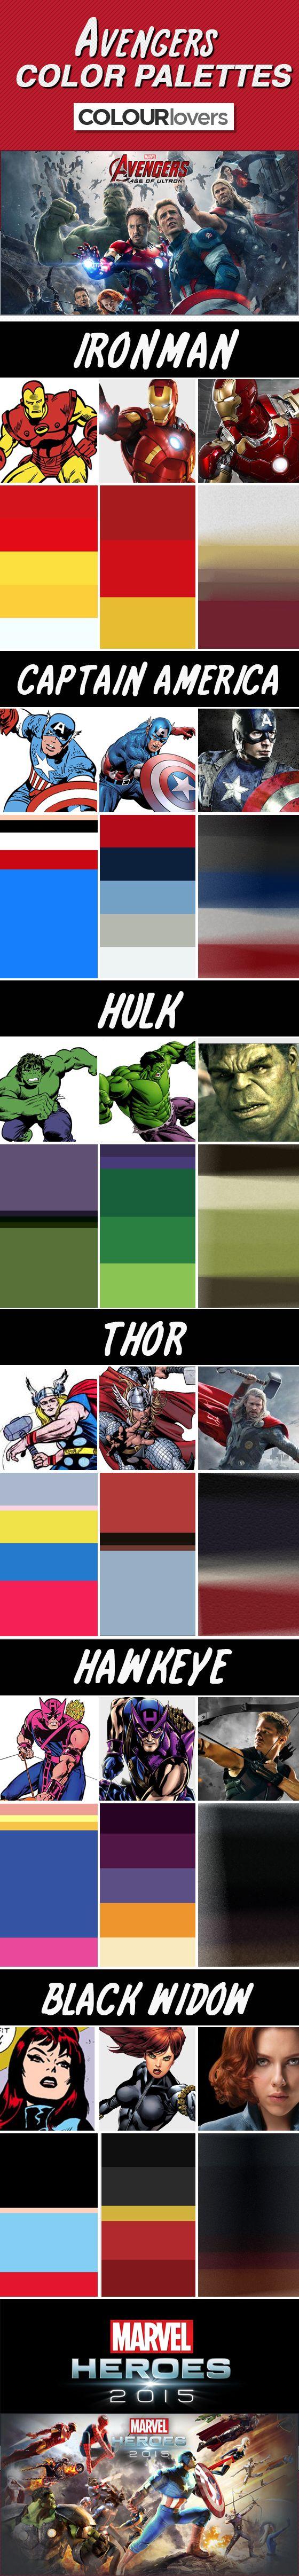 Web Blog / Marvel's Avengers 2 - Character Color Palettes [ Infographic ] by COLOURlovers :: COLOURlovers